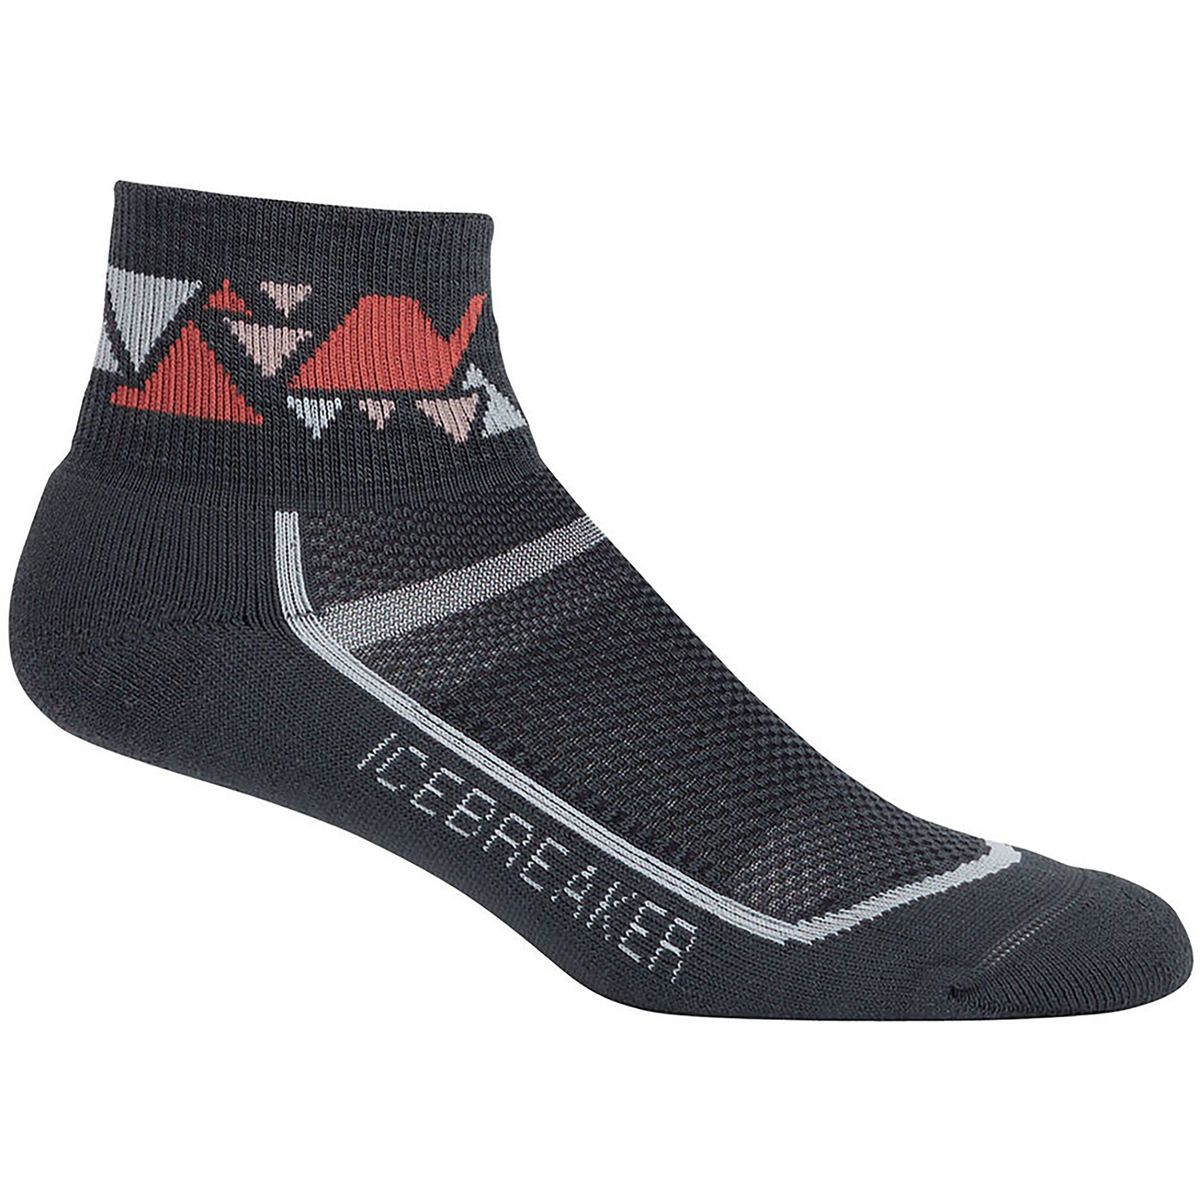 Icebreaker Multisport Cushion Mini Sock - Women